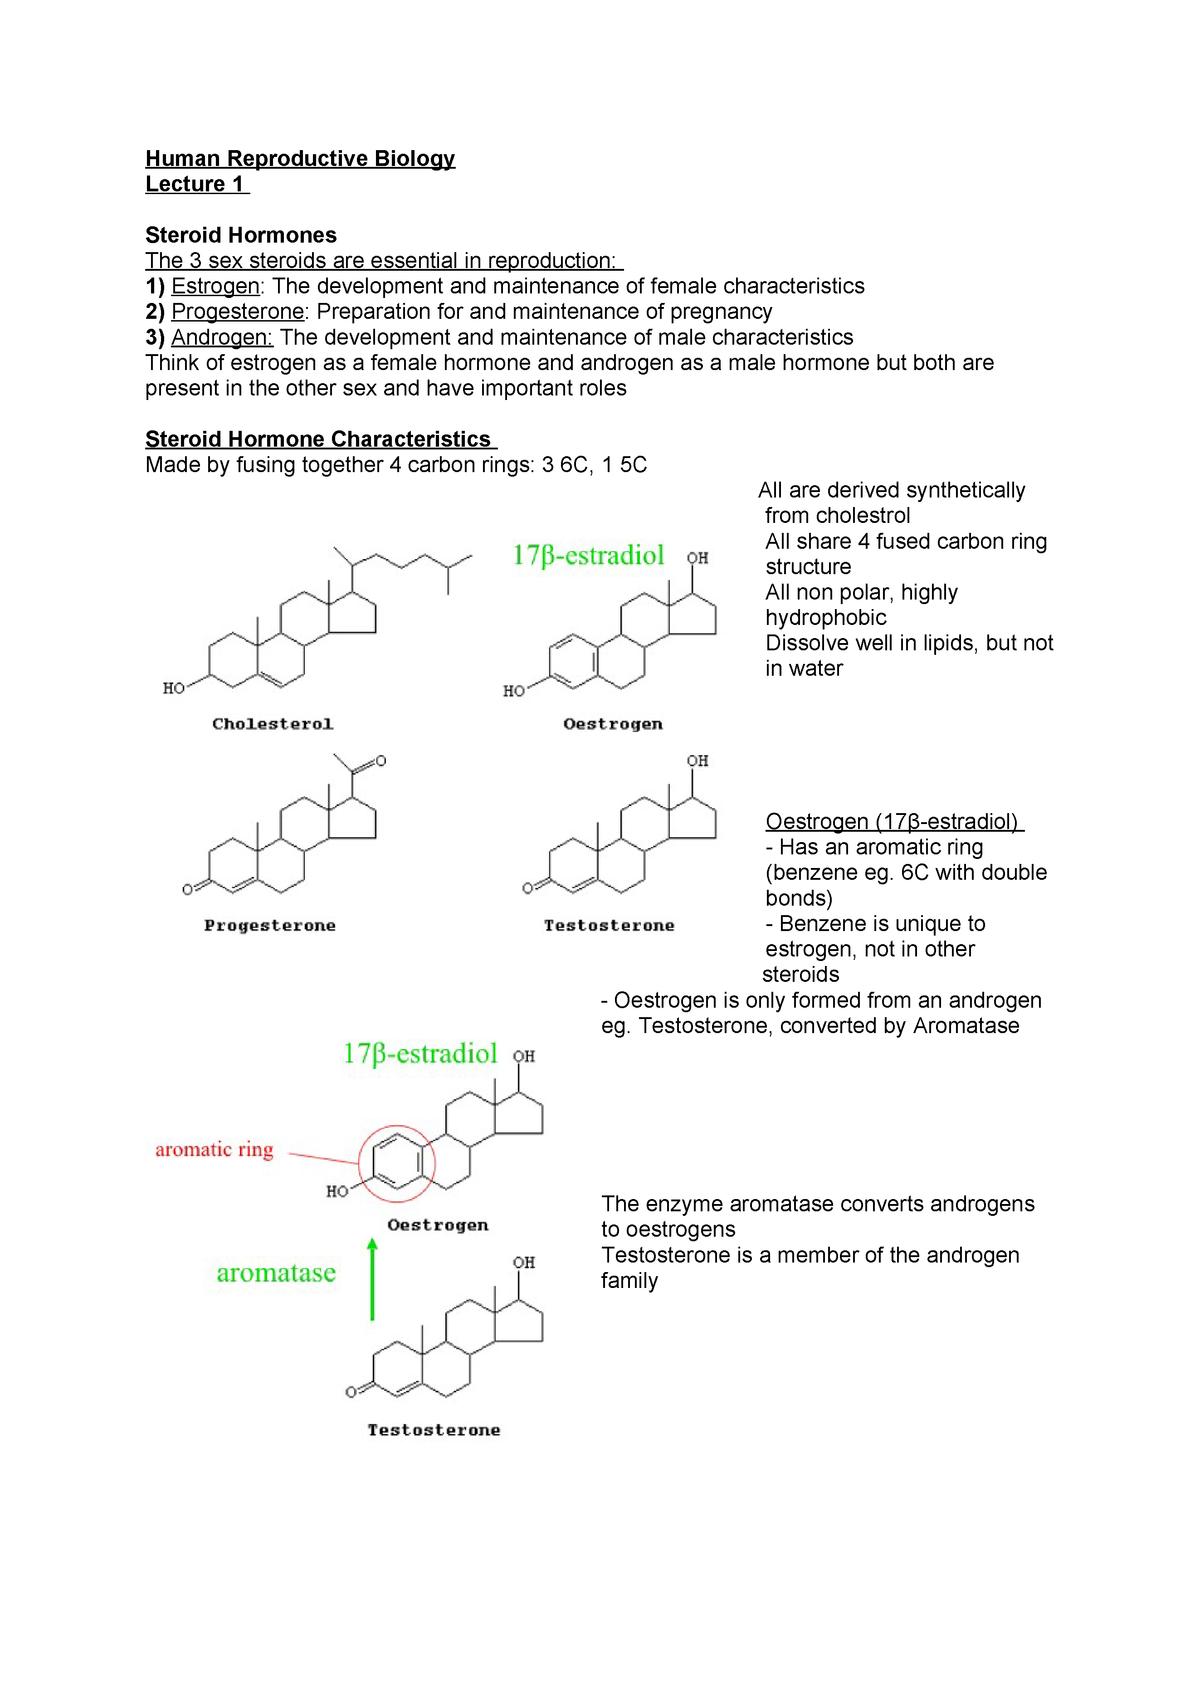 Human Reproductive Biology Lecture 1 - BIOL31561 : Human